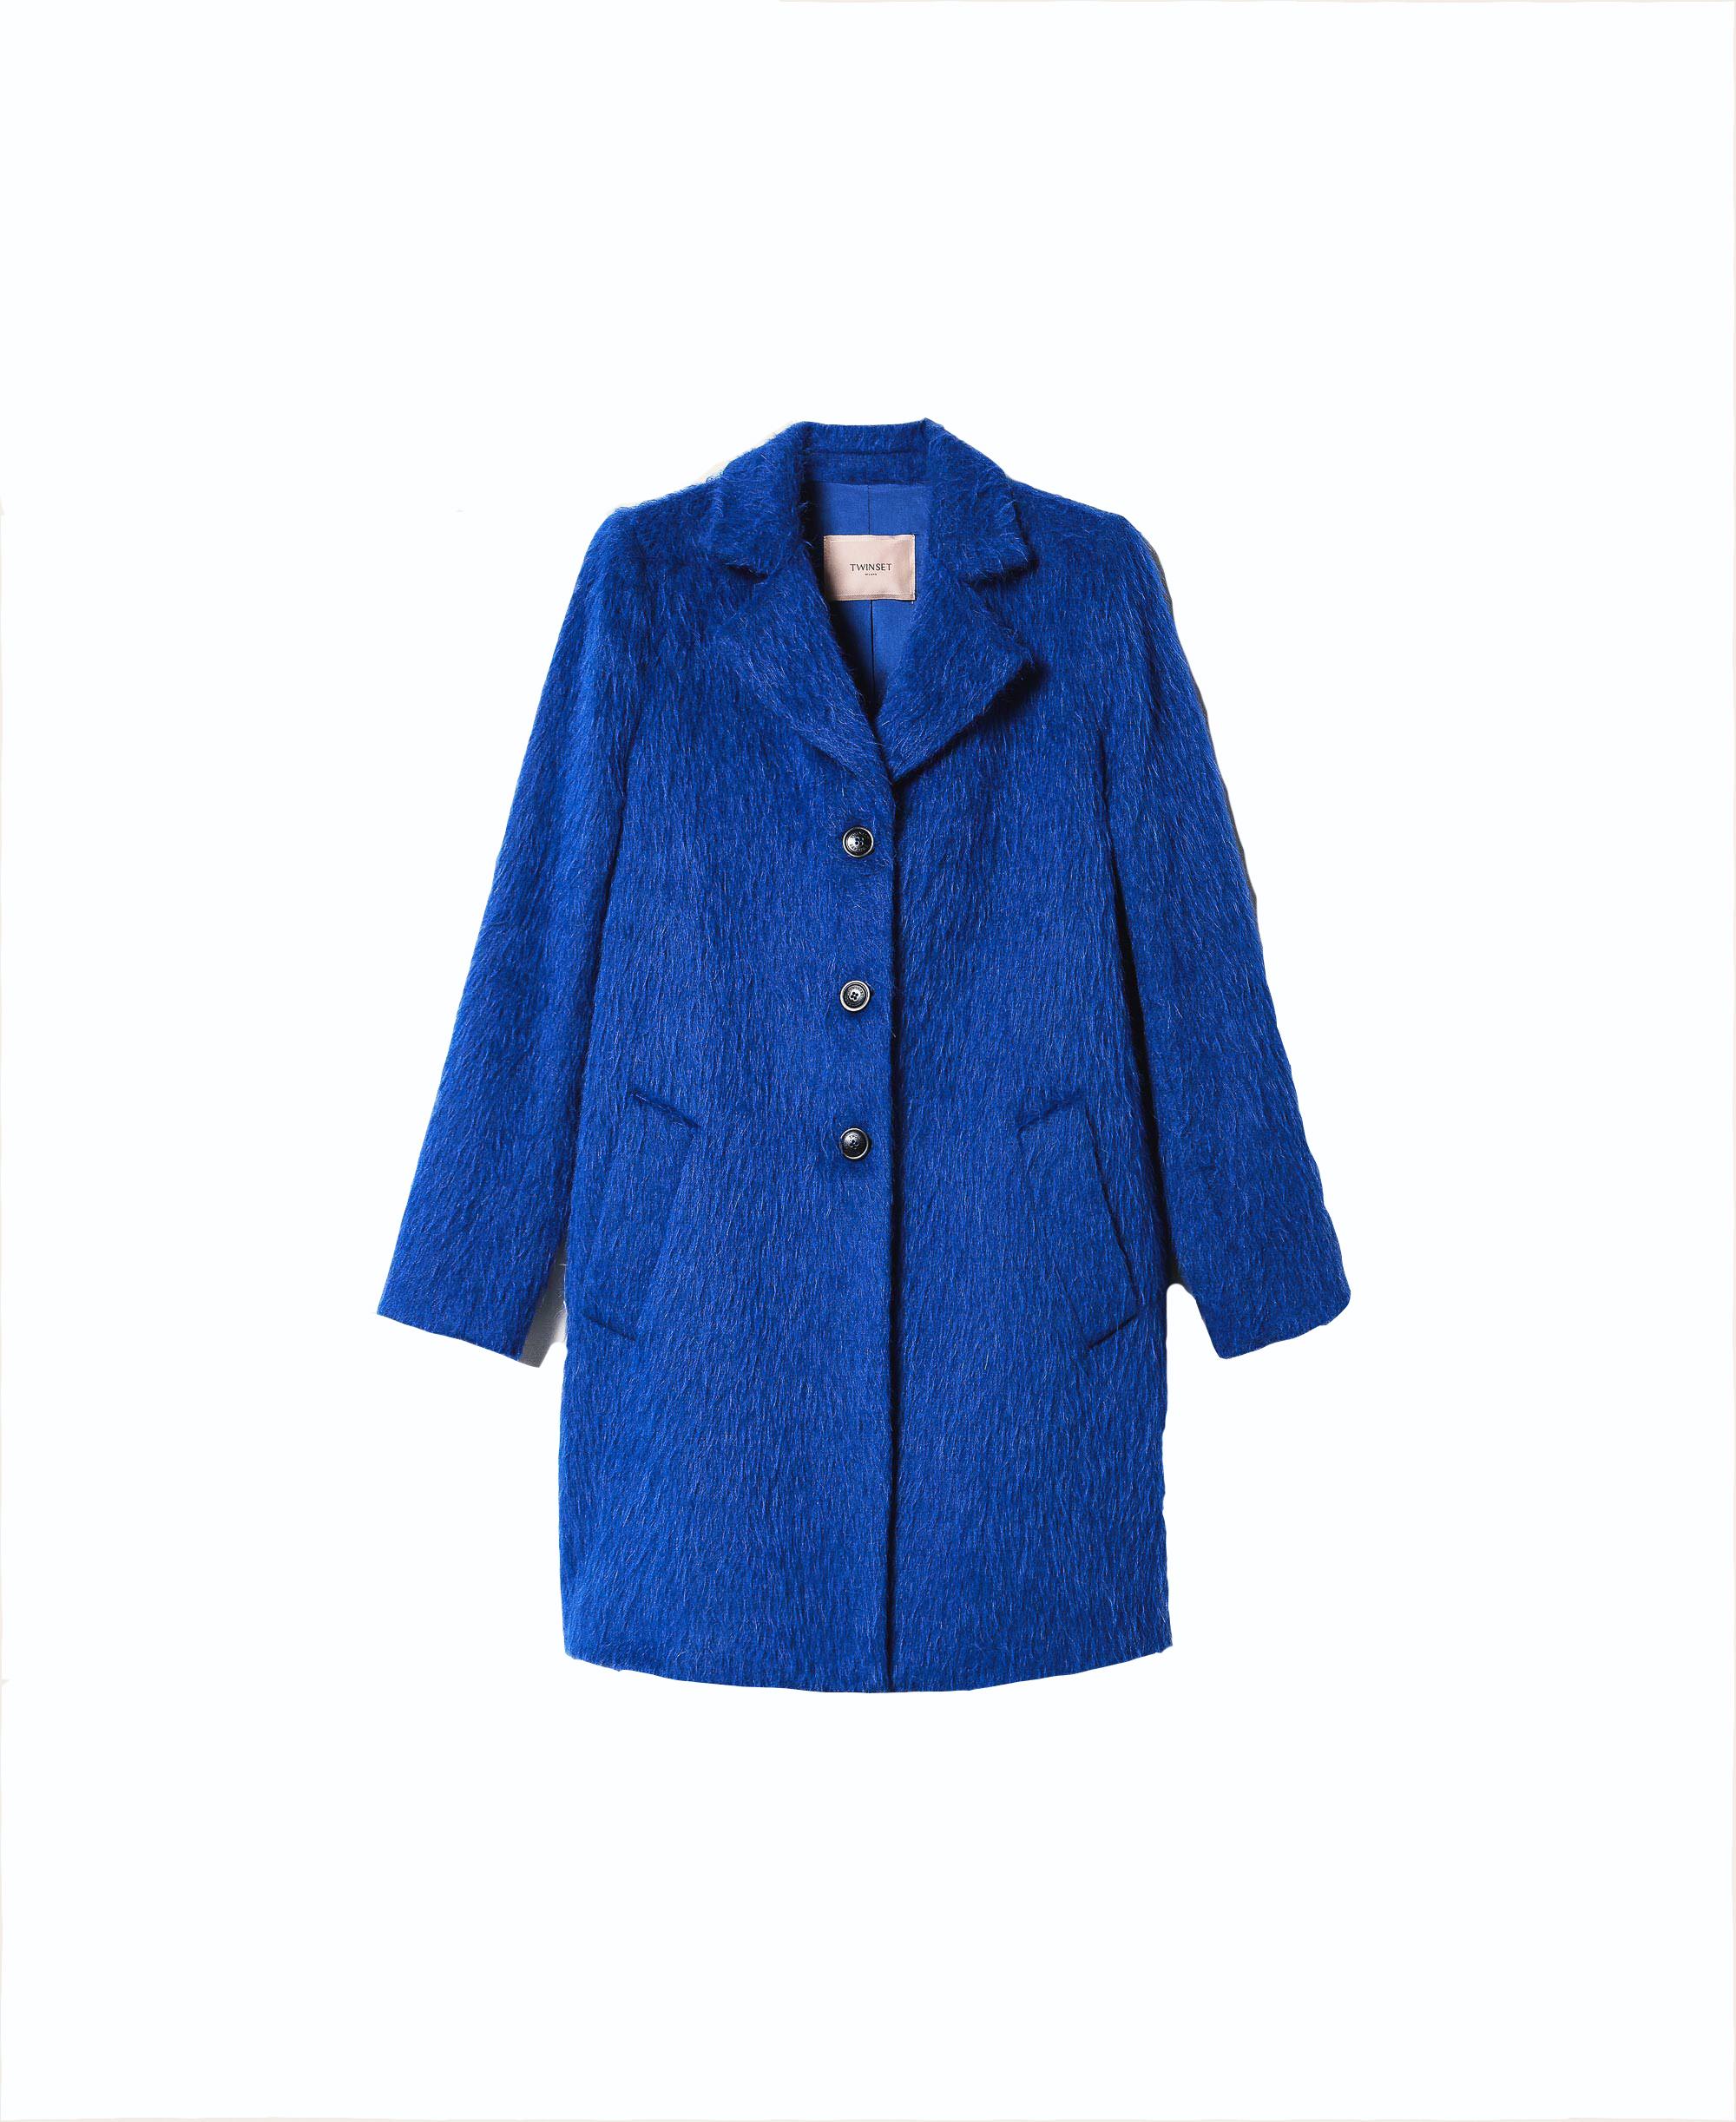 Twinset, teddy coat, blue